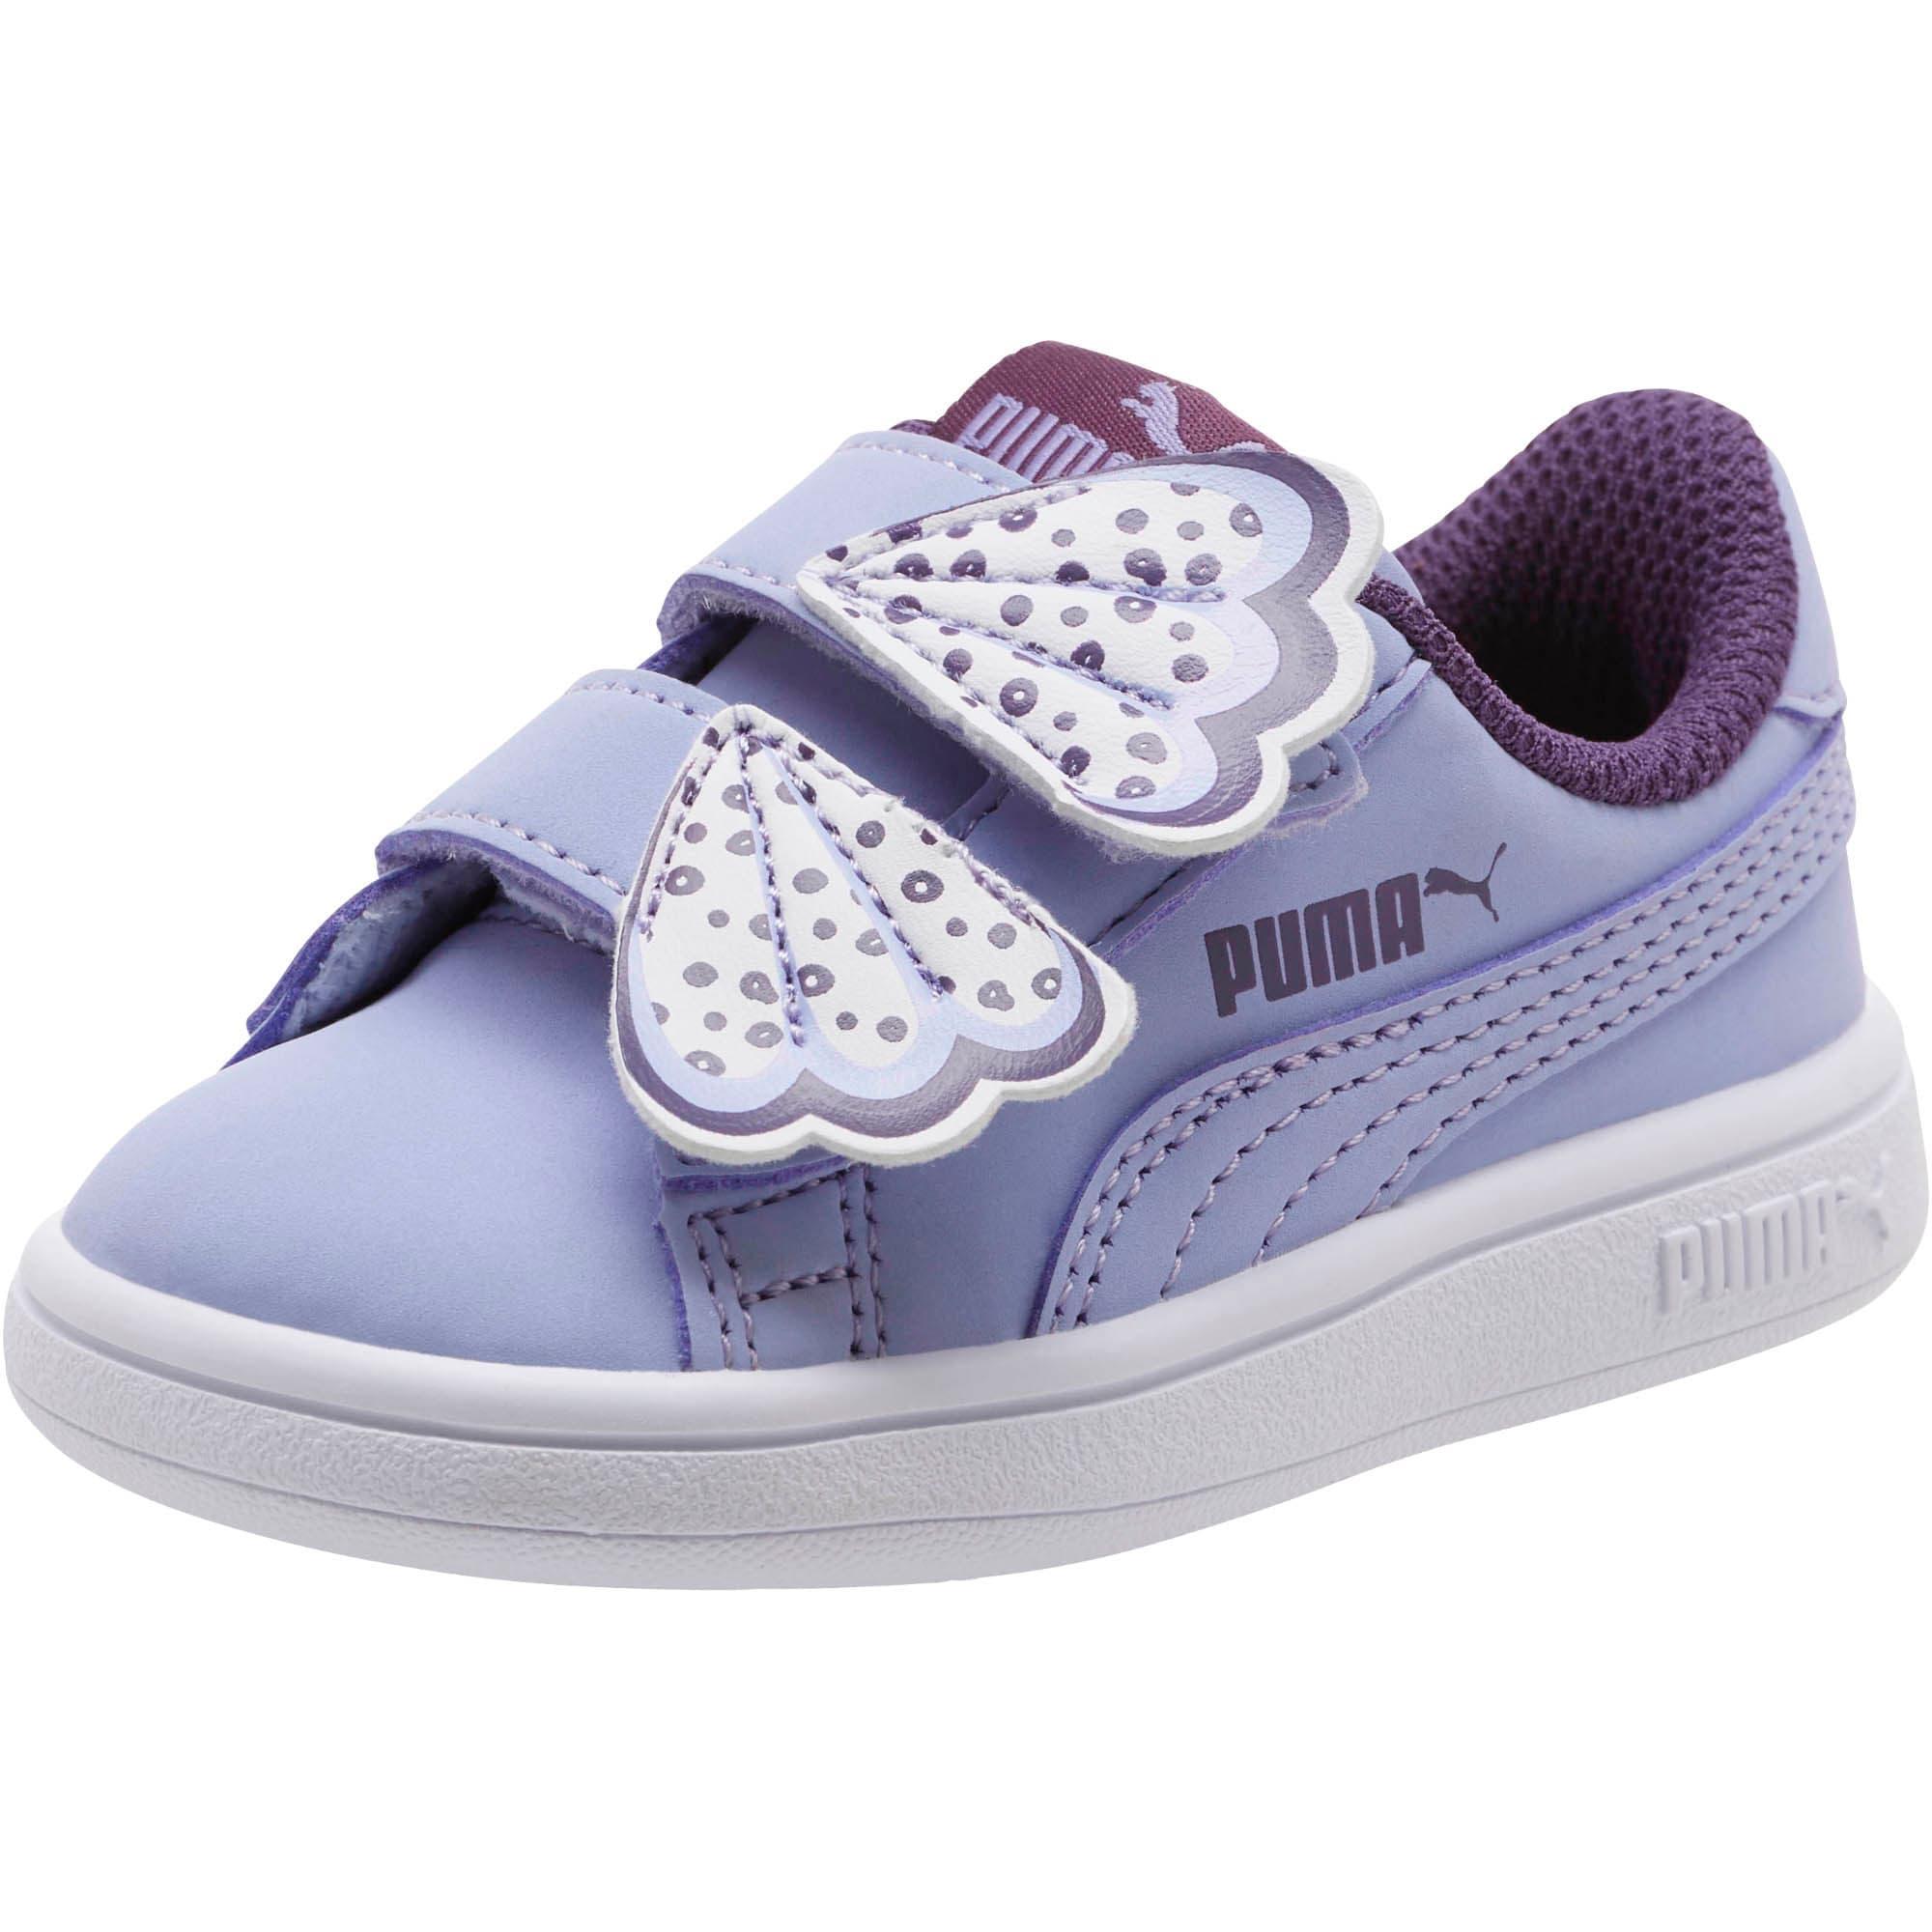 Thumbnail 1 of PUMA Smash v2 Butterfly AC Toddler Shoes, Sweet Lavender-Indigo-White, medium